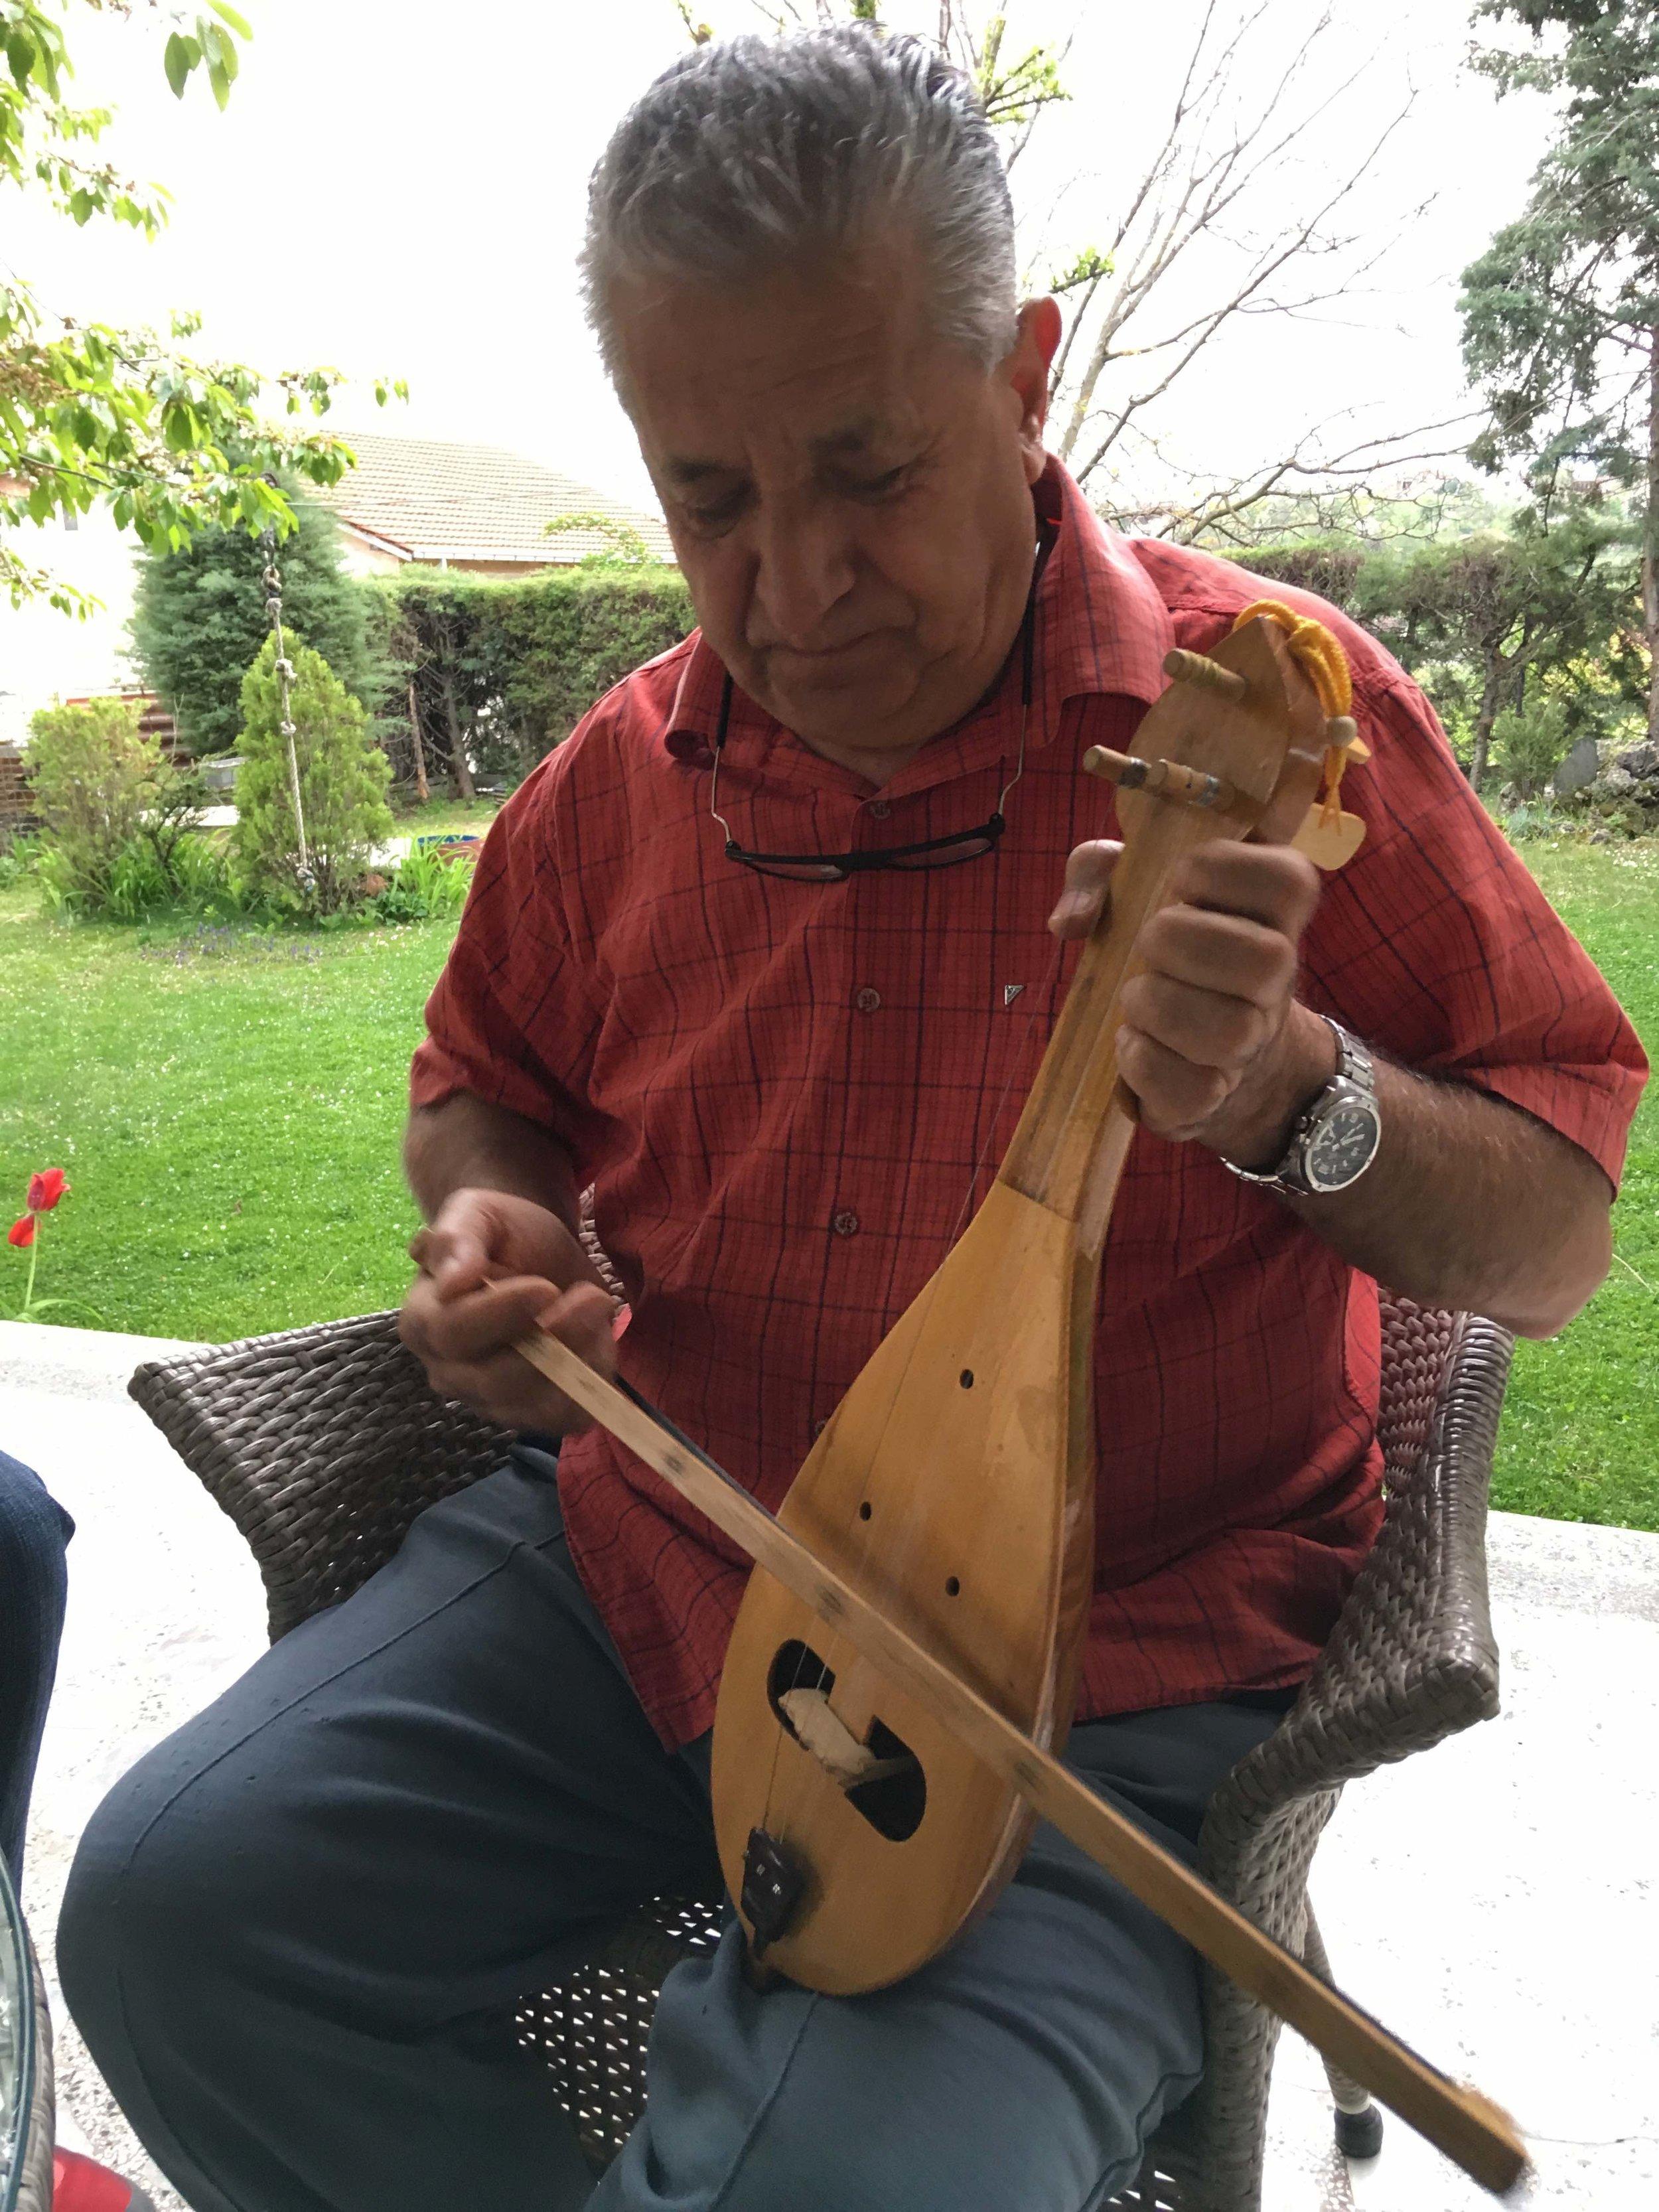 Boro Stoilov playing kemane, Skopje, Macedonia